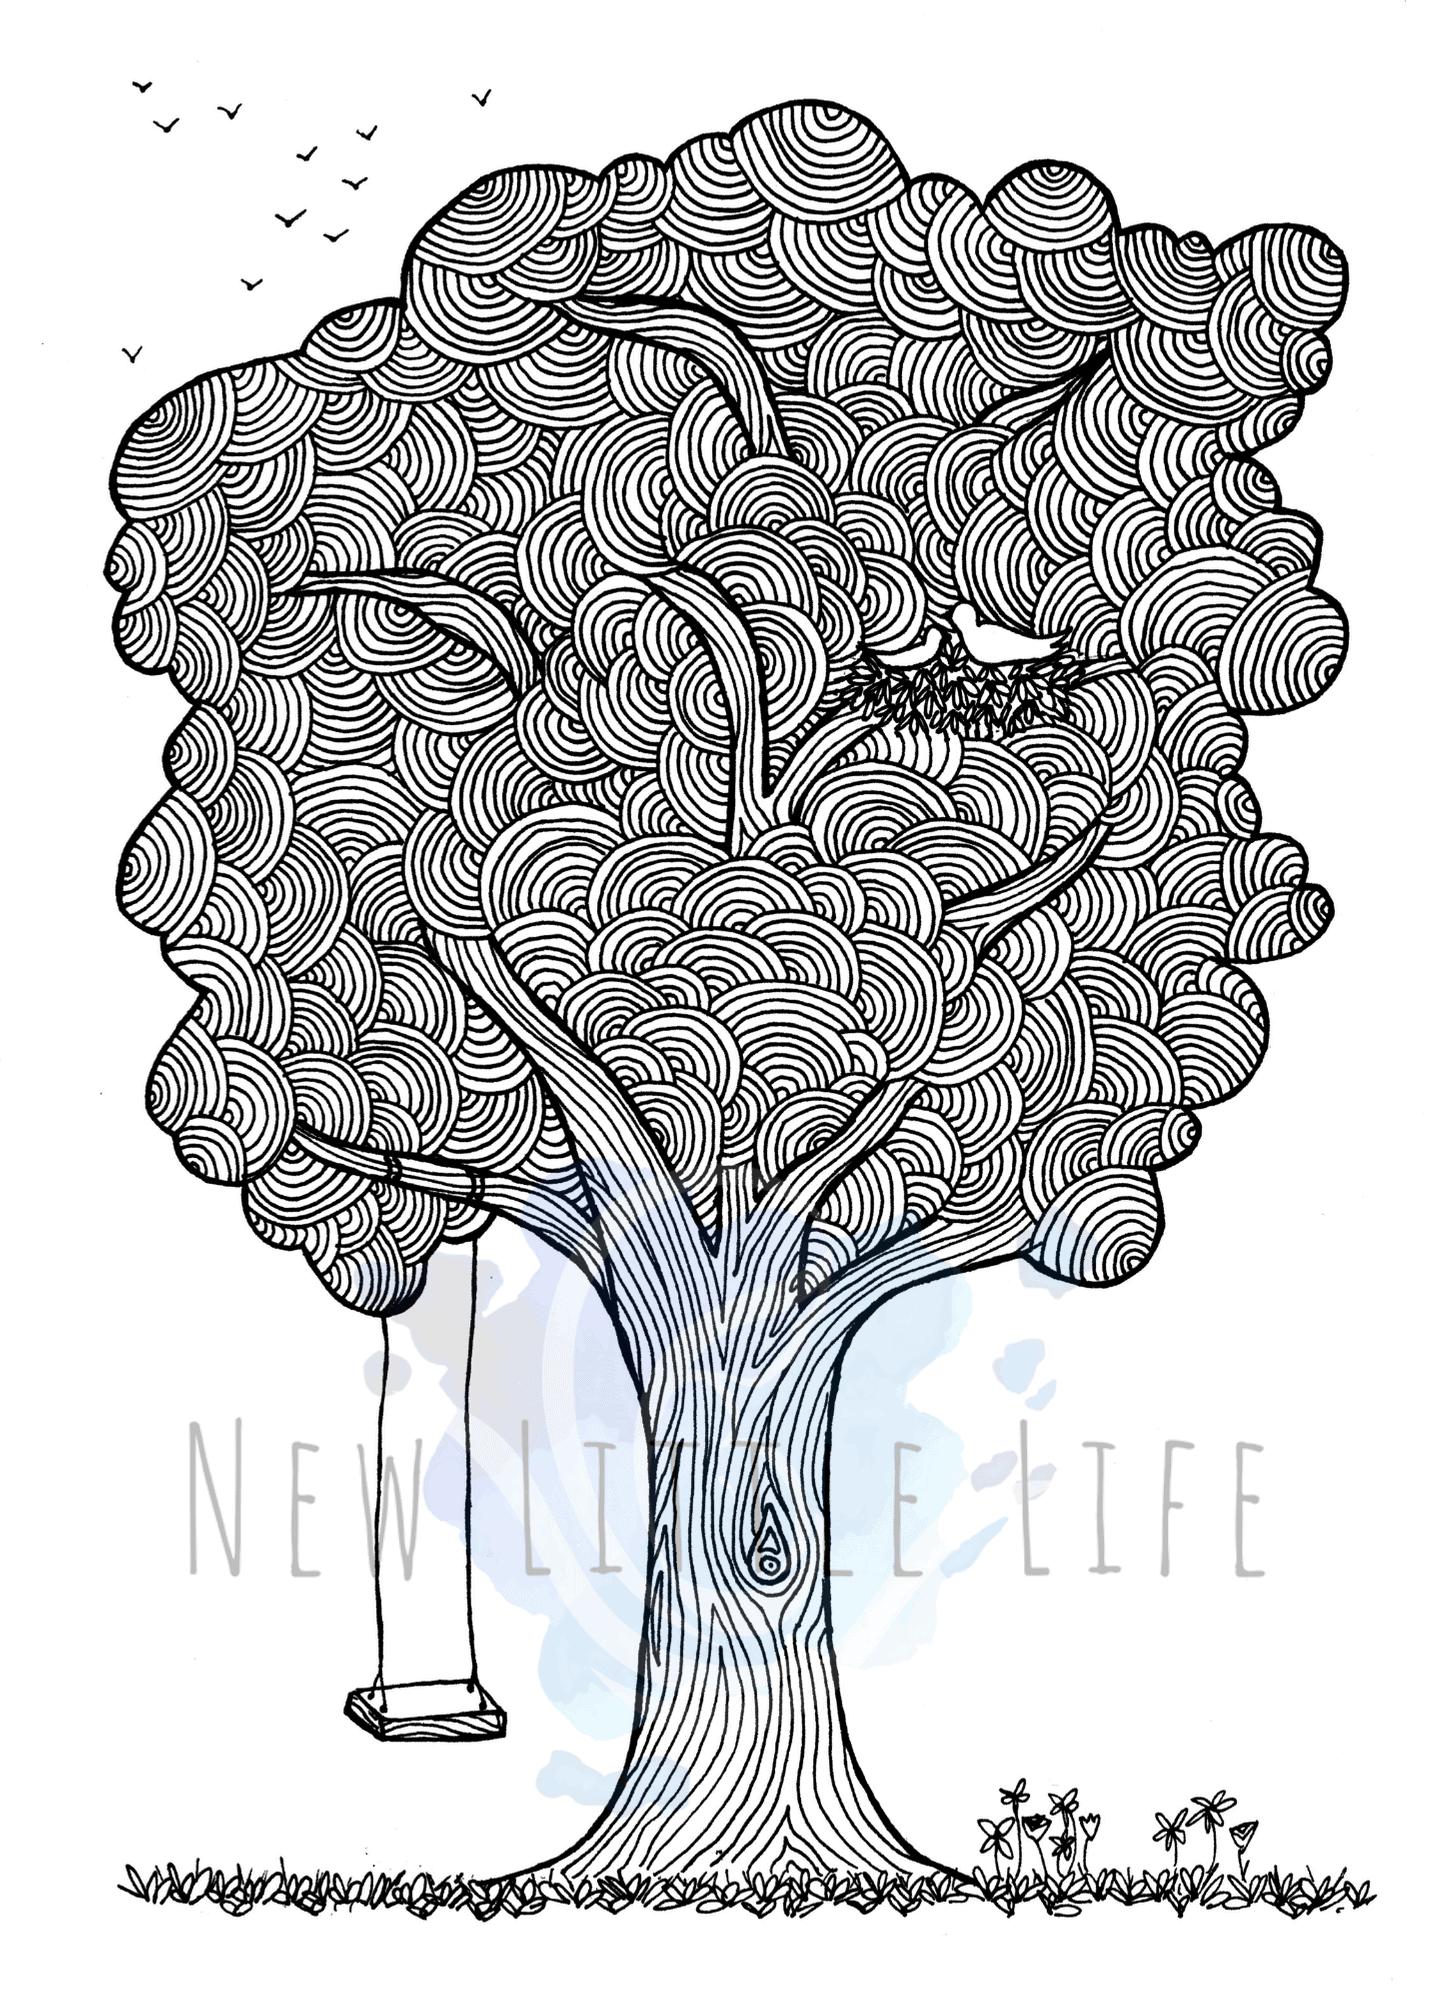 Untitled design (26)